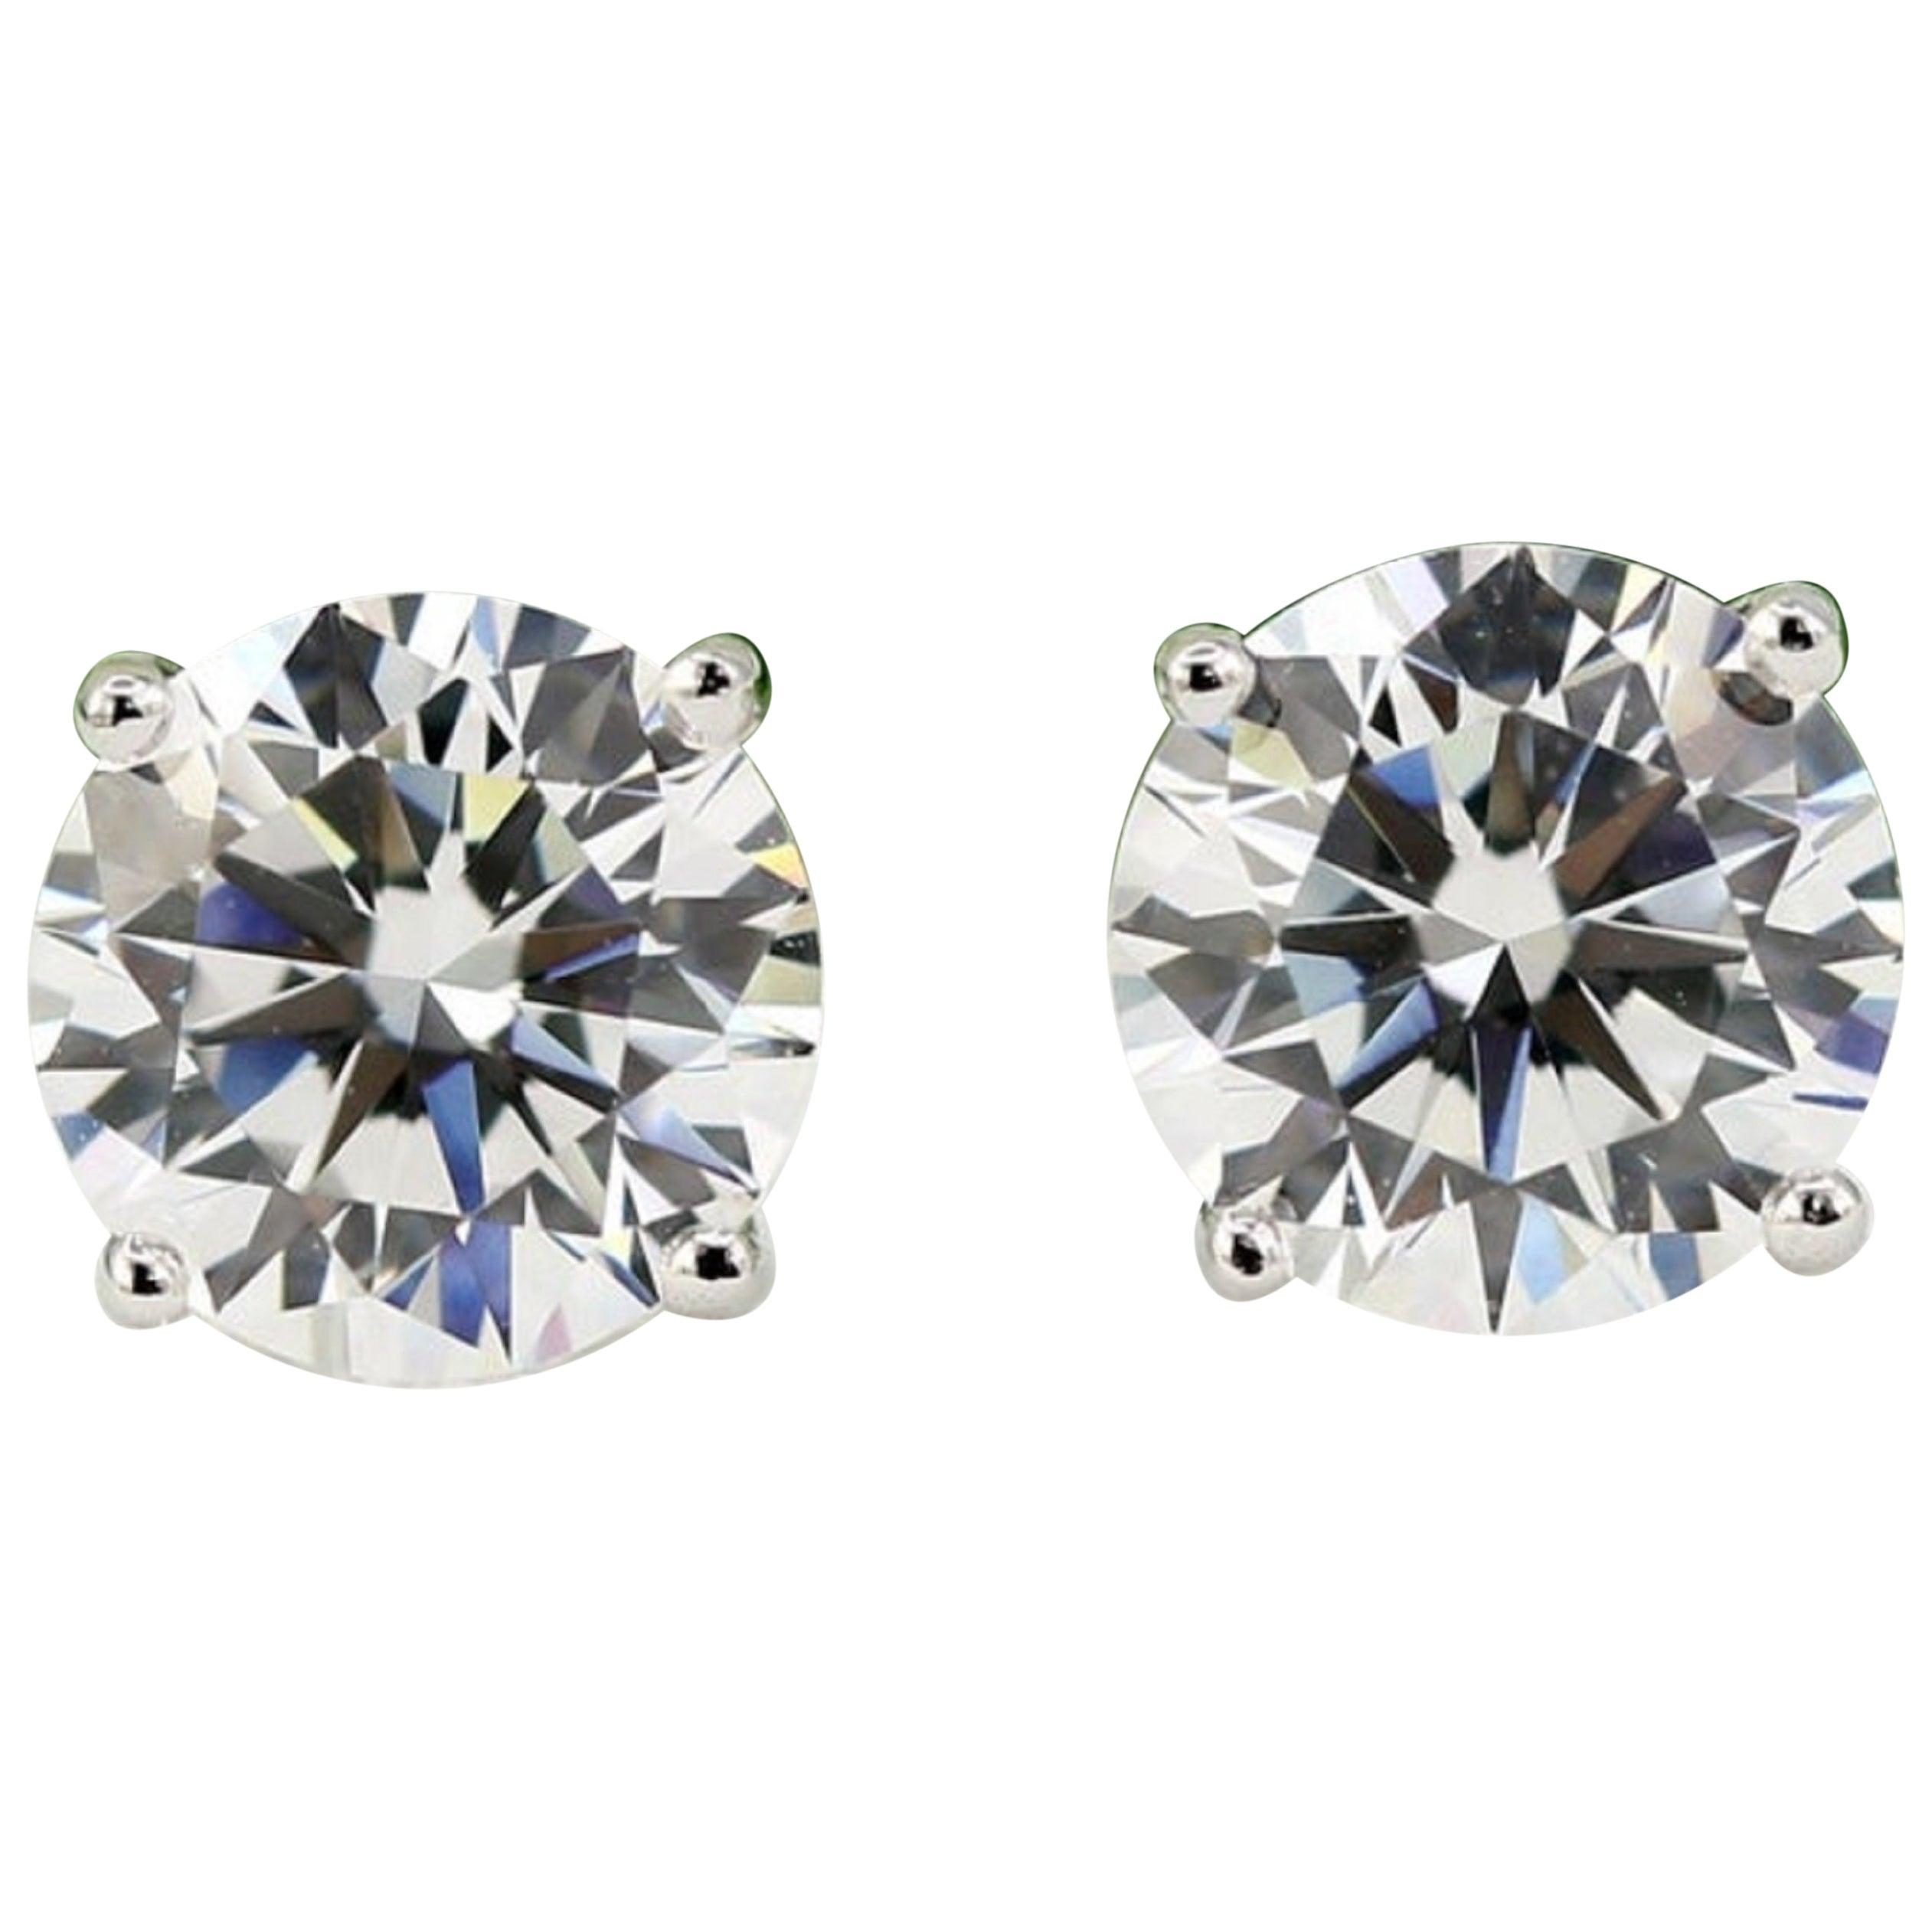 GIA Certified 3.03 Carat Brilliant Cut Diamond Studs I Color VS2/SI1 Clarity